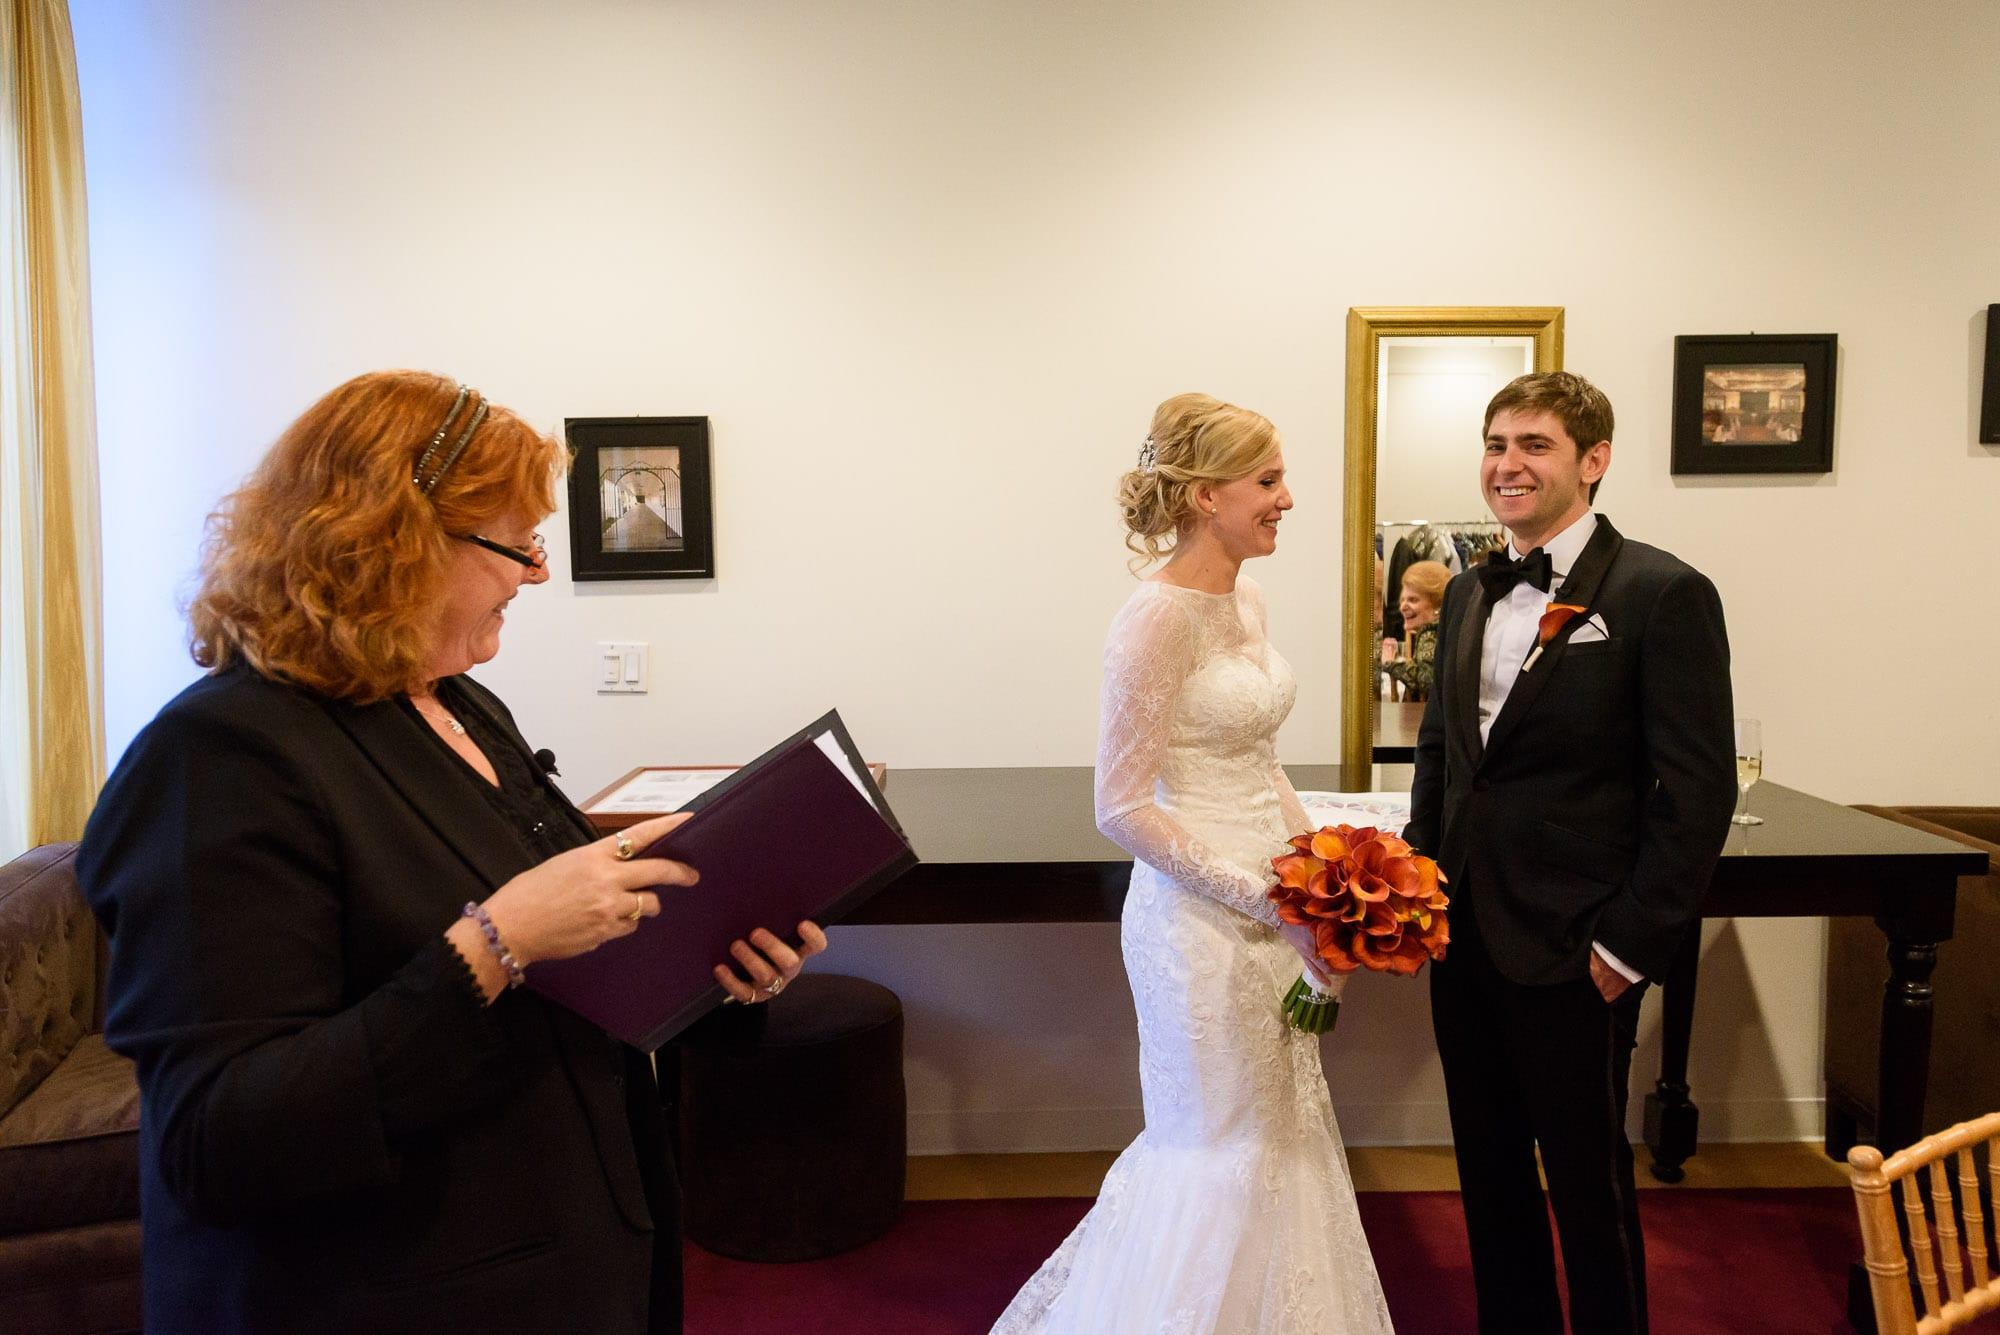 035_Alan_and_Heidi_Los_Angeles_Equestrian_Center_Wedding